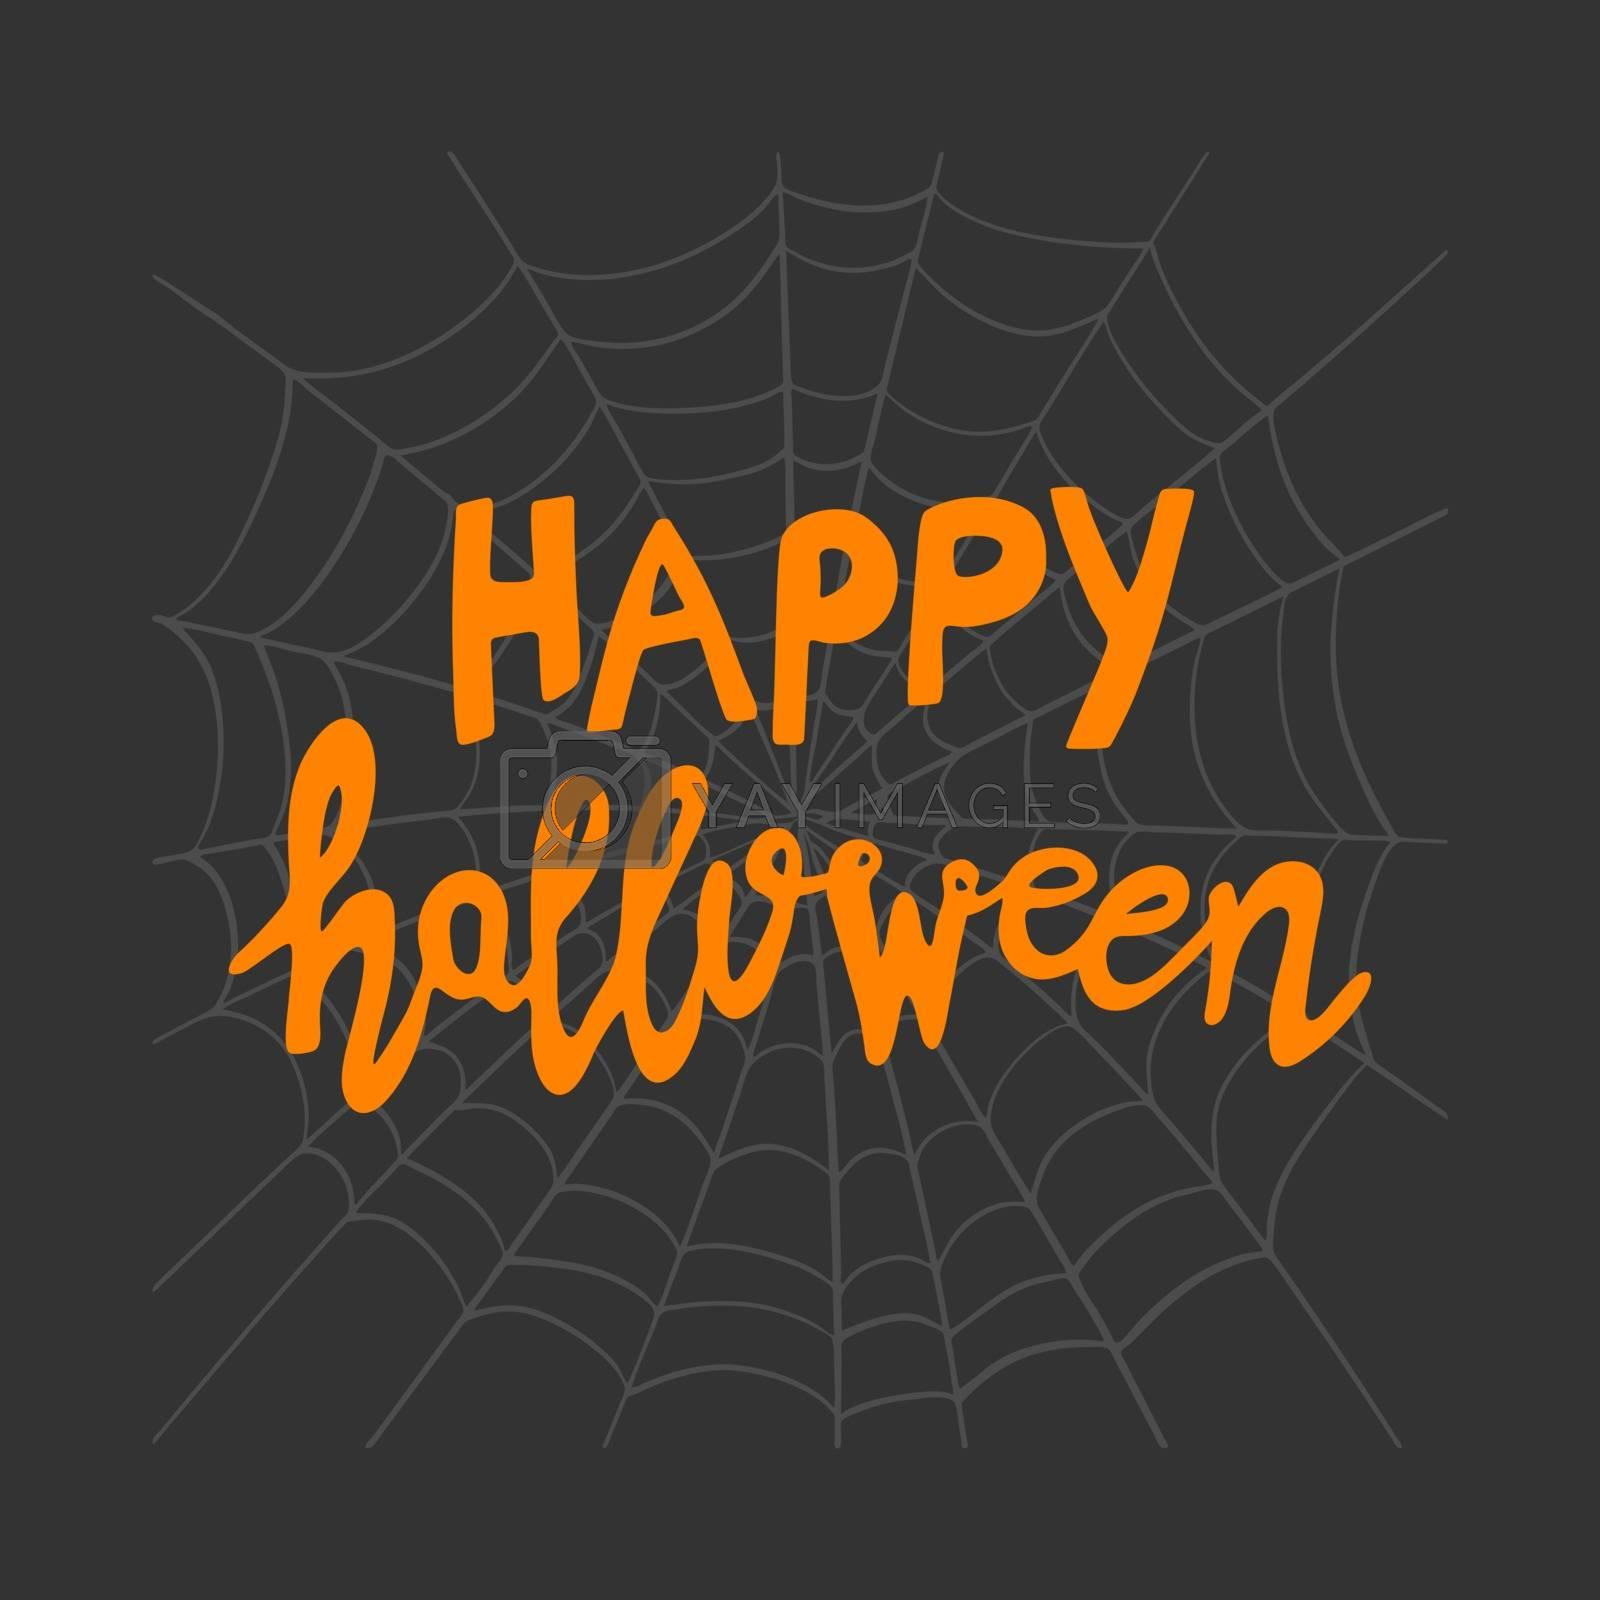 Happy Halloween. Orange handwritten lettering on grey spiderweb sketch on dark background. Vector stock illustration.